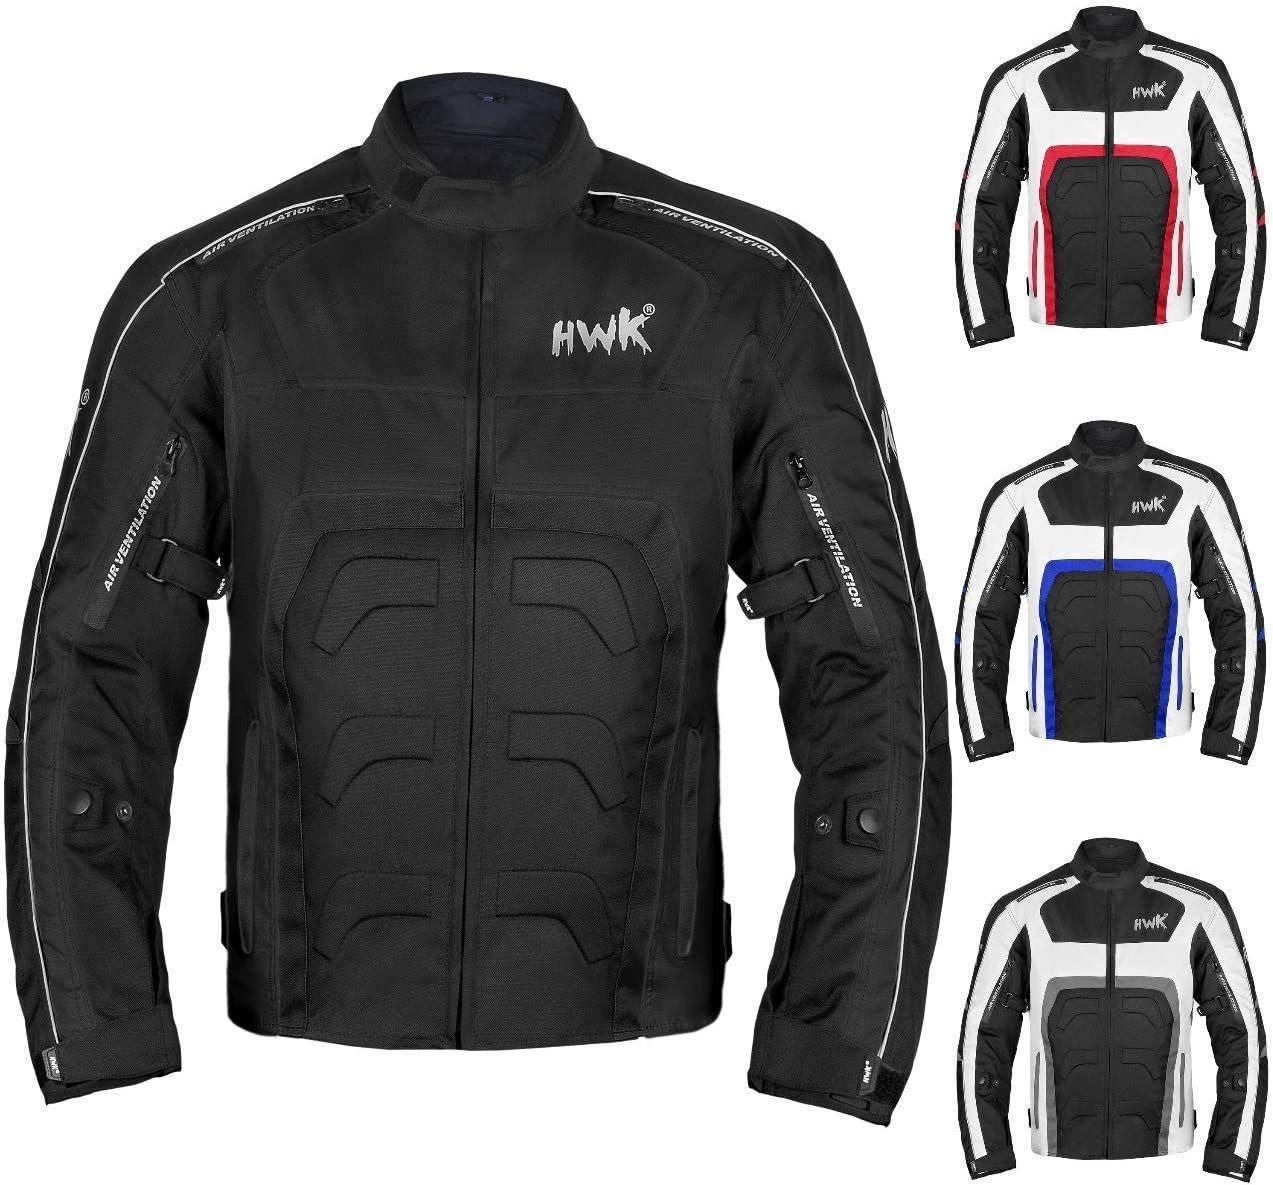 Textile Motorcycle Jacket For Men Dualsport Enduro Motorbike Biker Riding Jacket Breathable CE ARMORED WATERPROOF (Black, L): Automotive